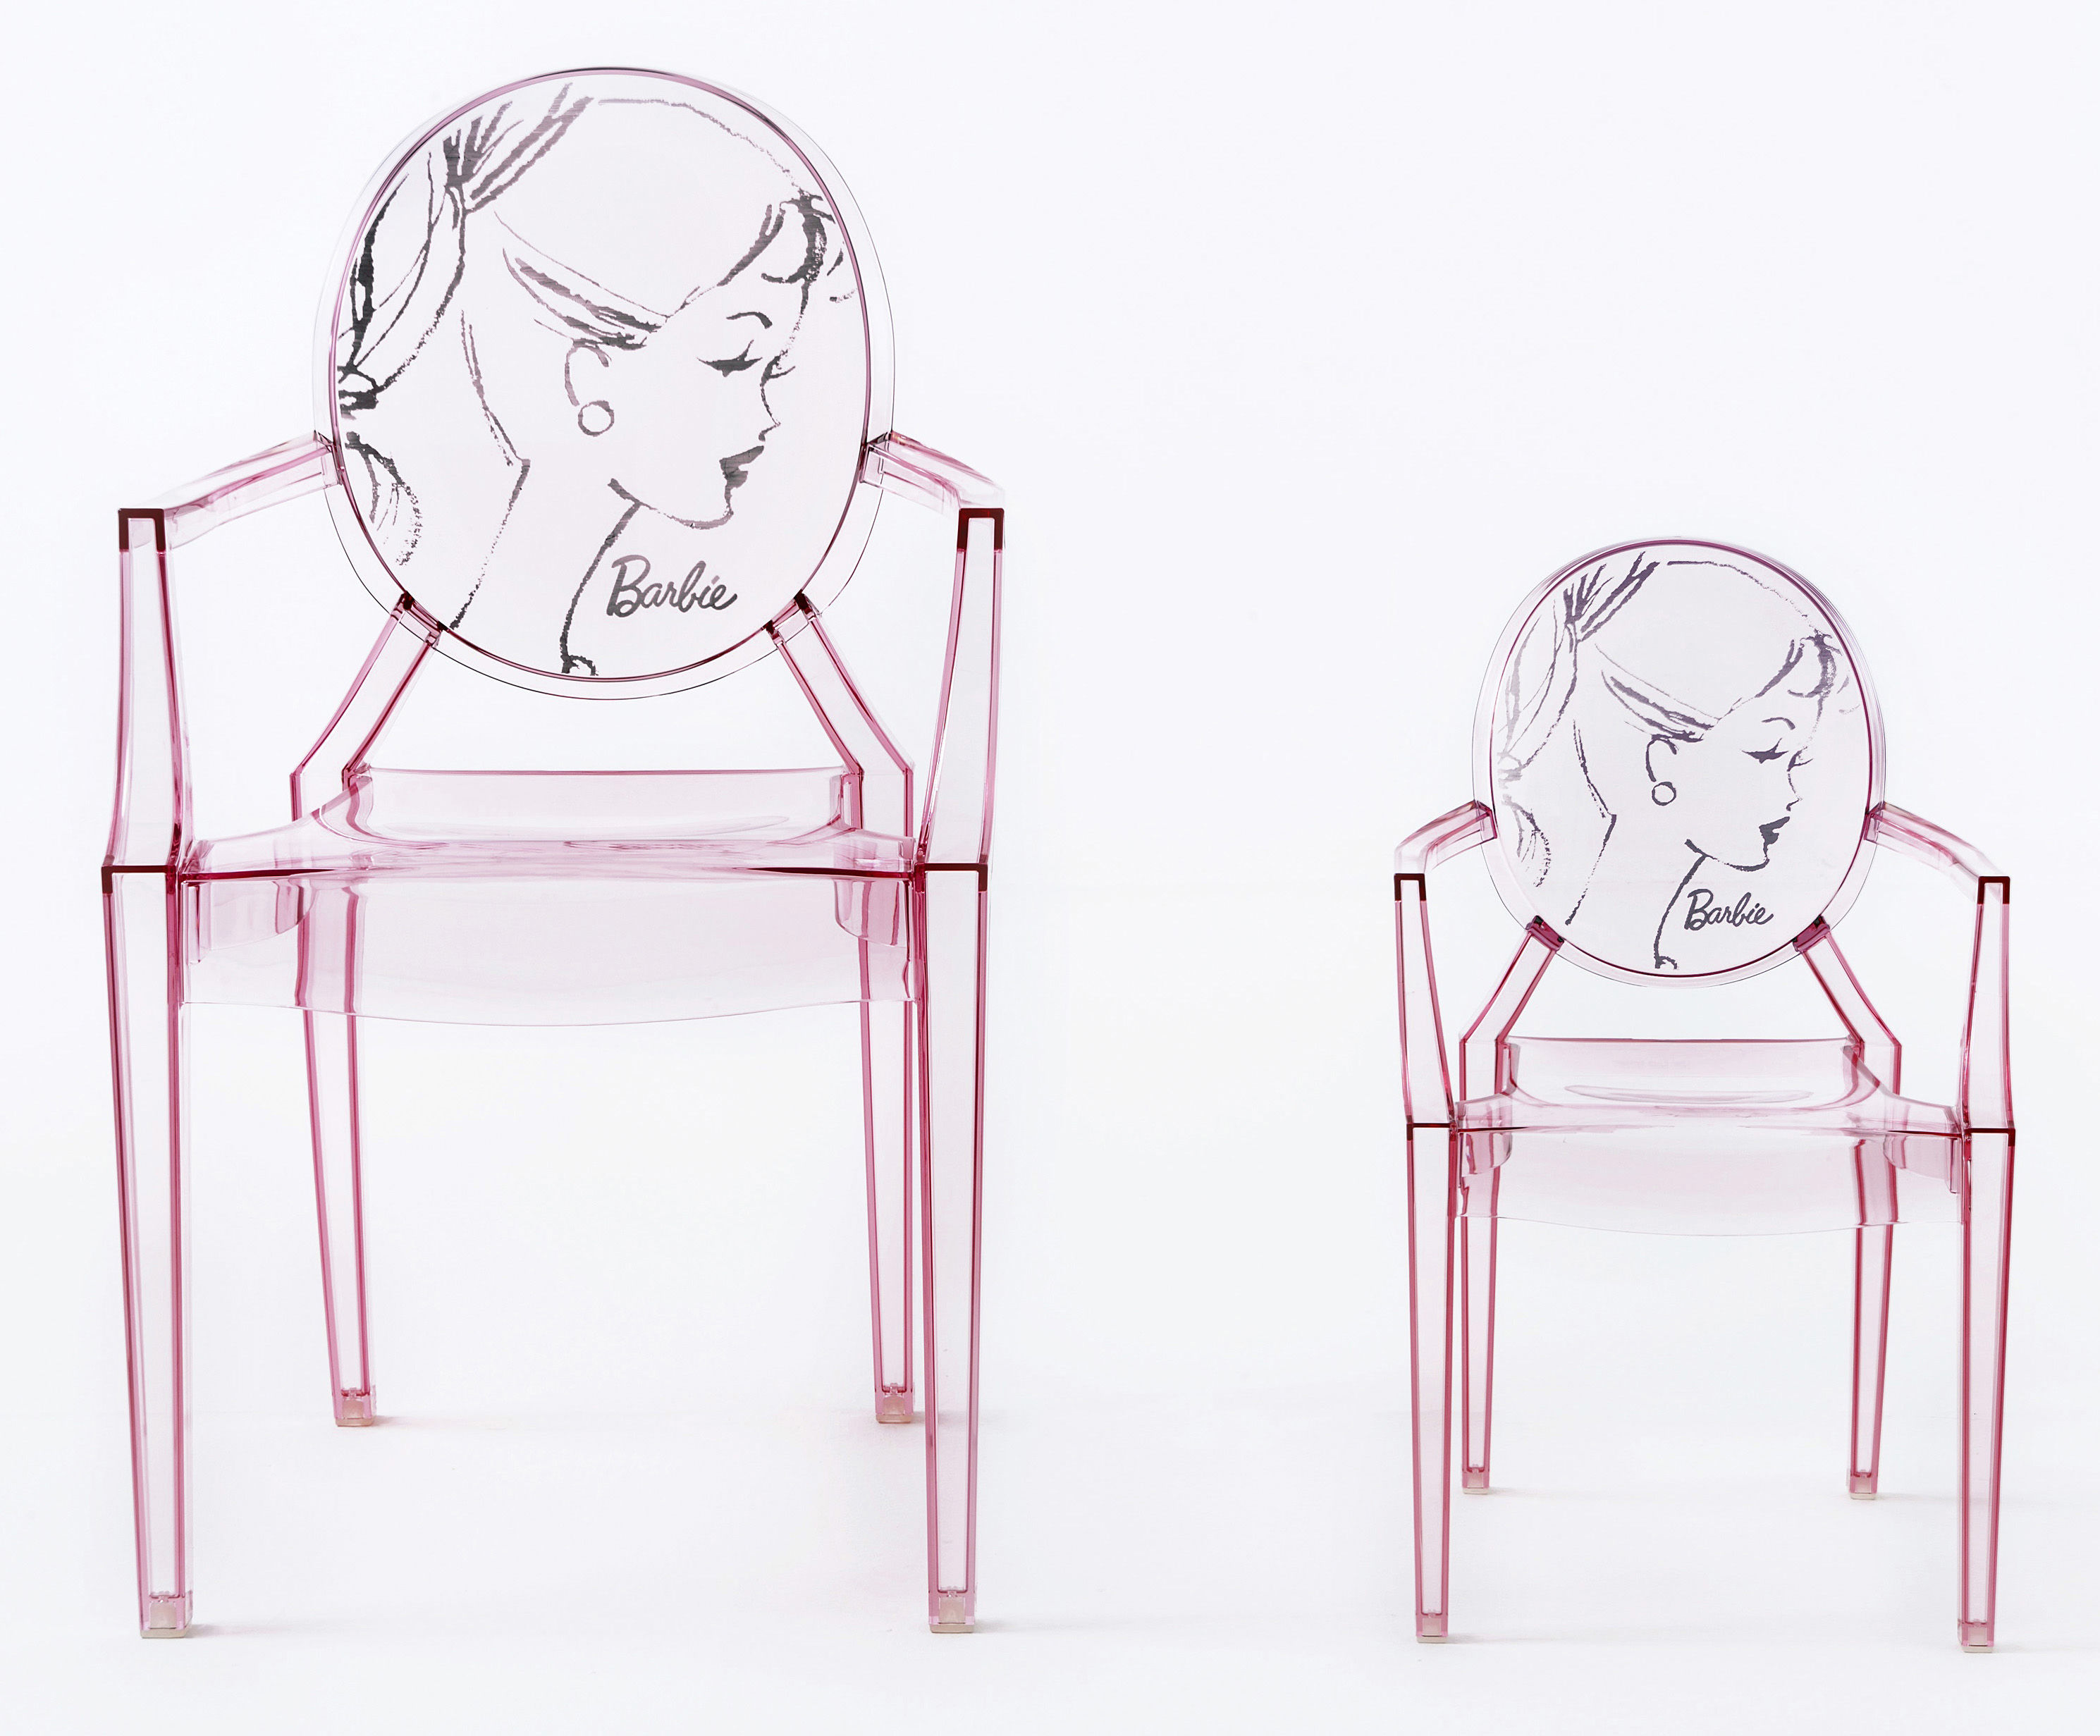 Scopri poltrona bambini lou lou ghost barbie sedia per for Poltrona bambini